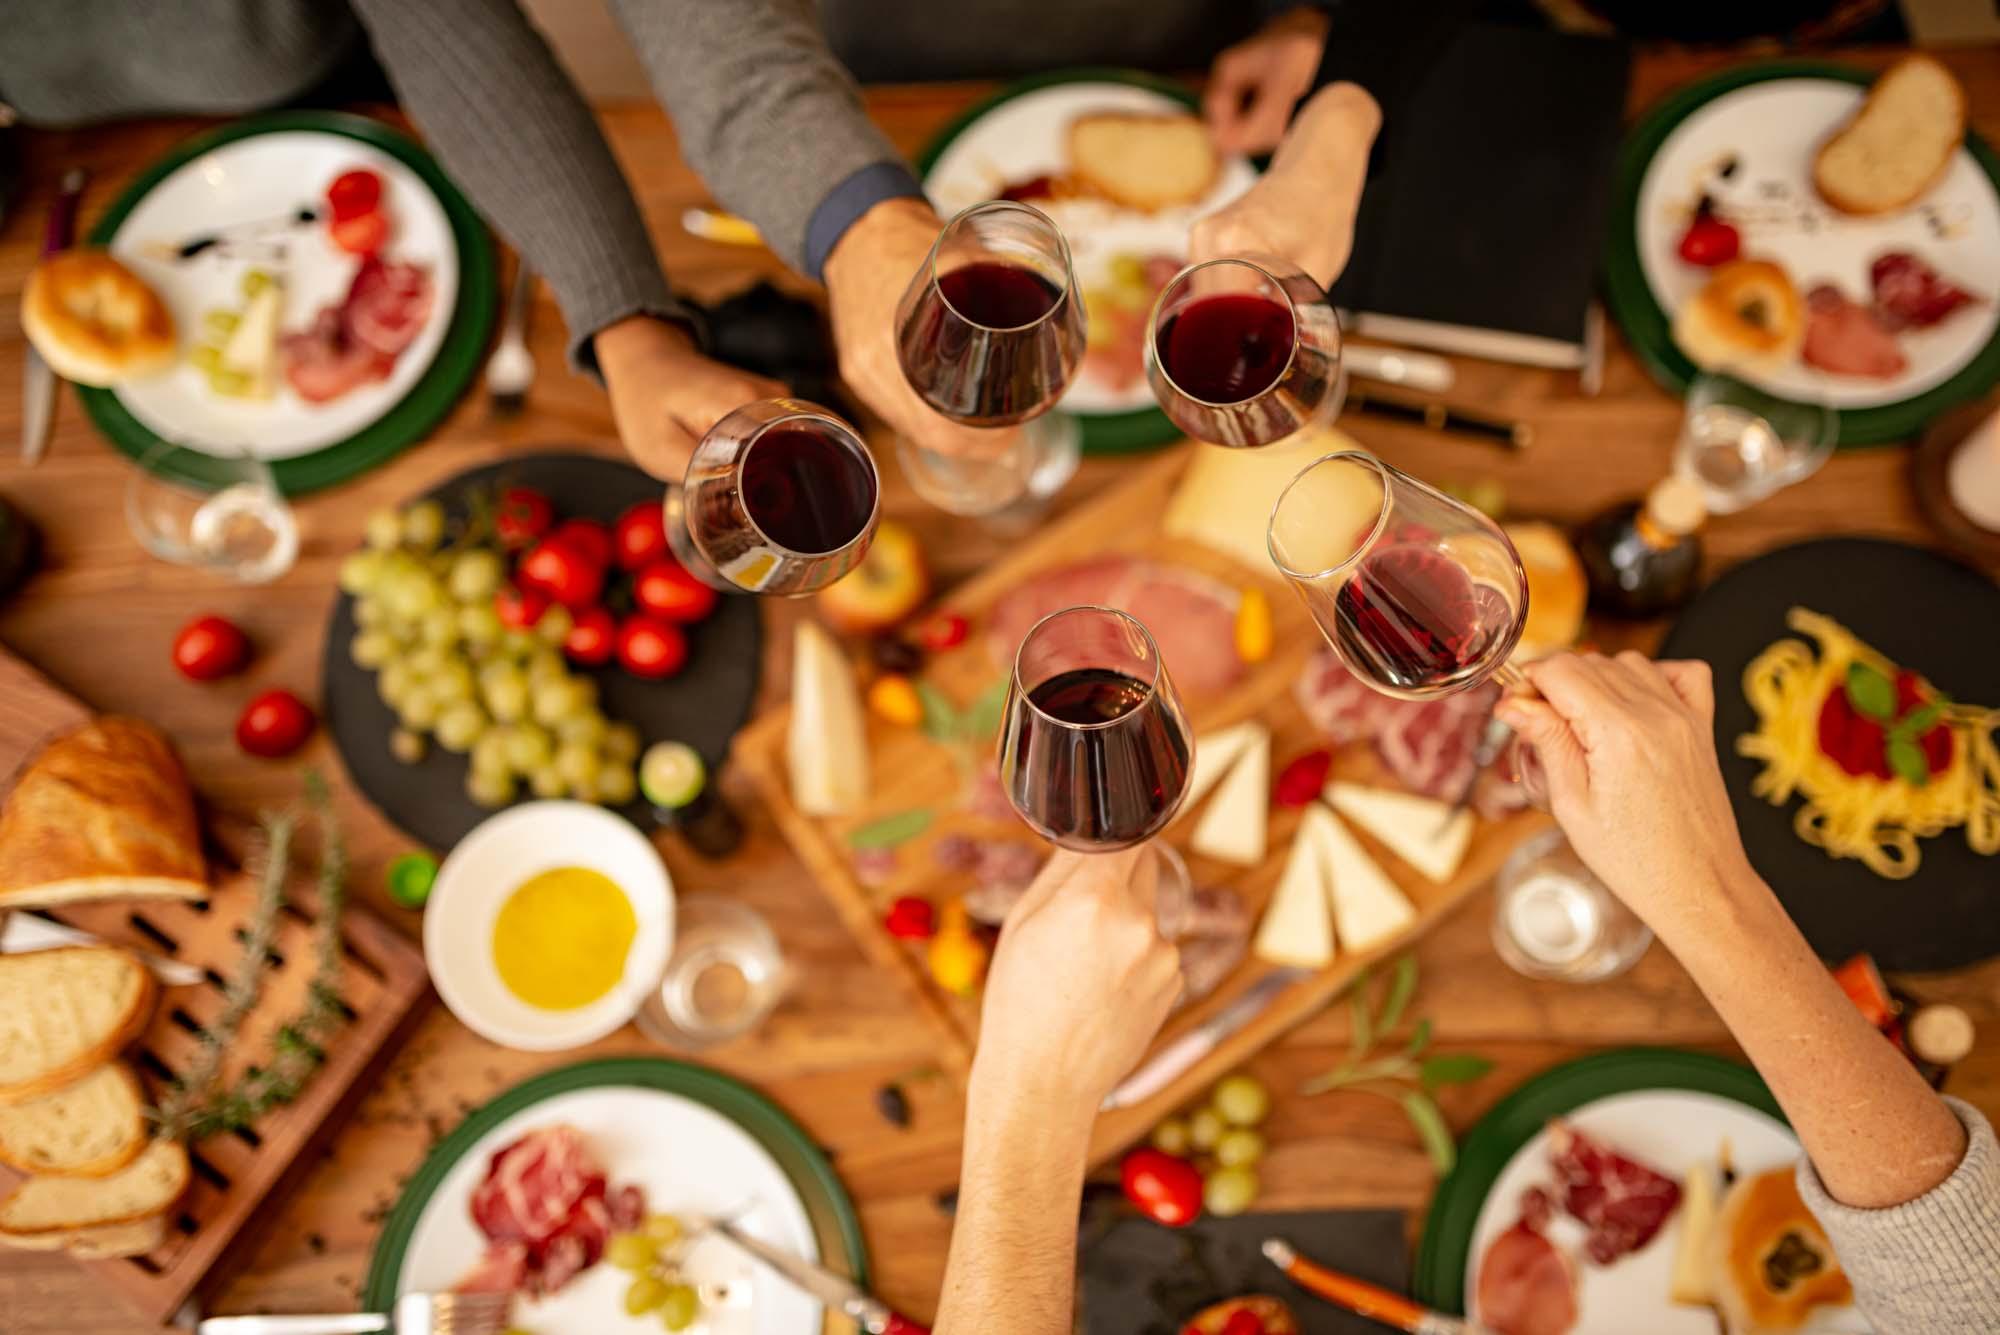 Corsi Di Cucina Cene Aziendali a Verona